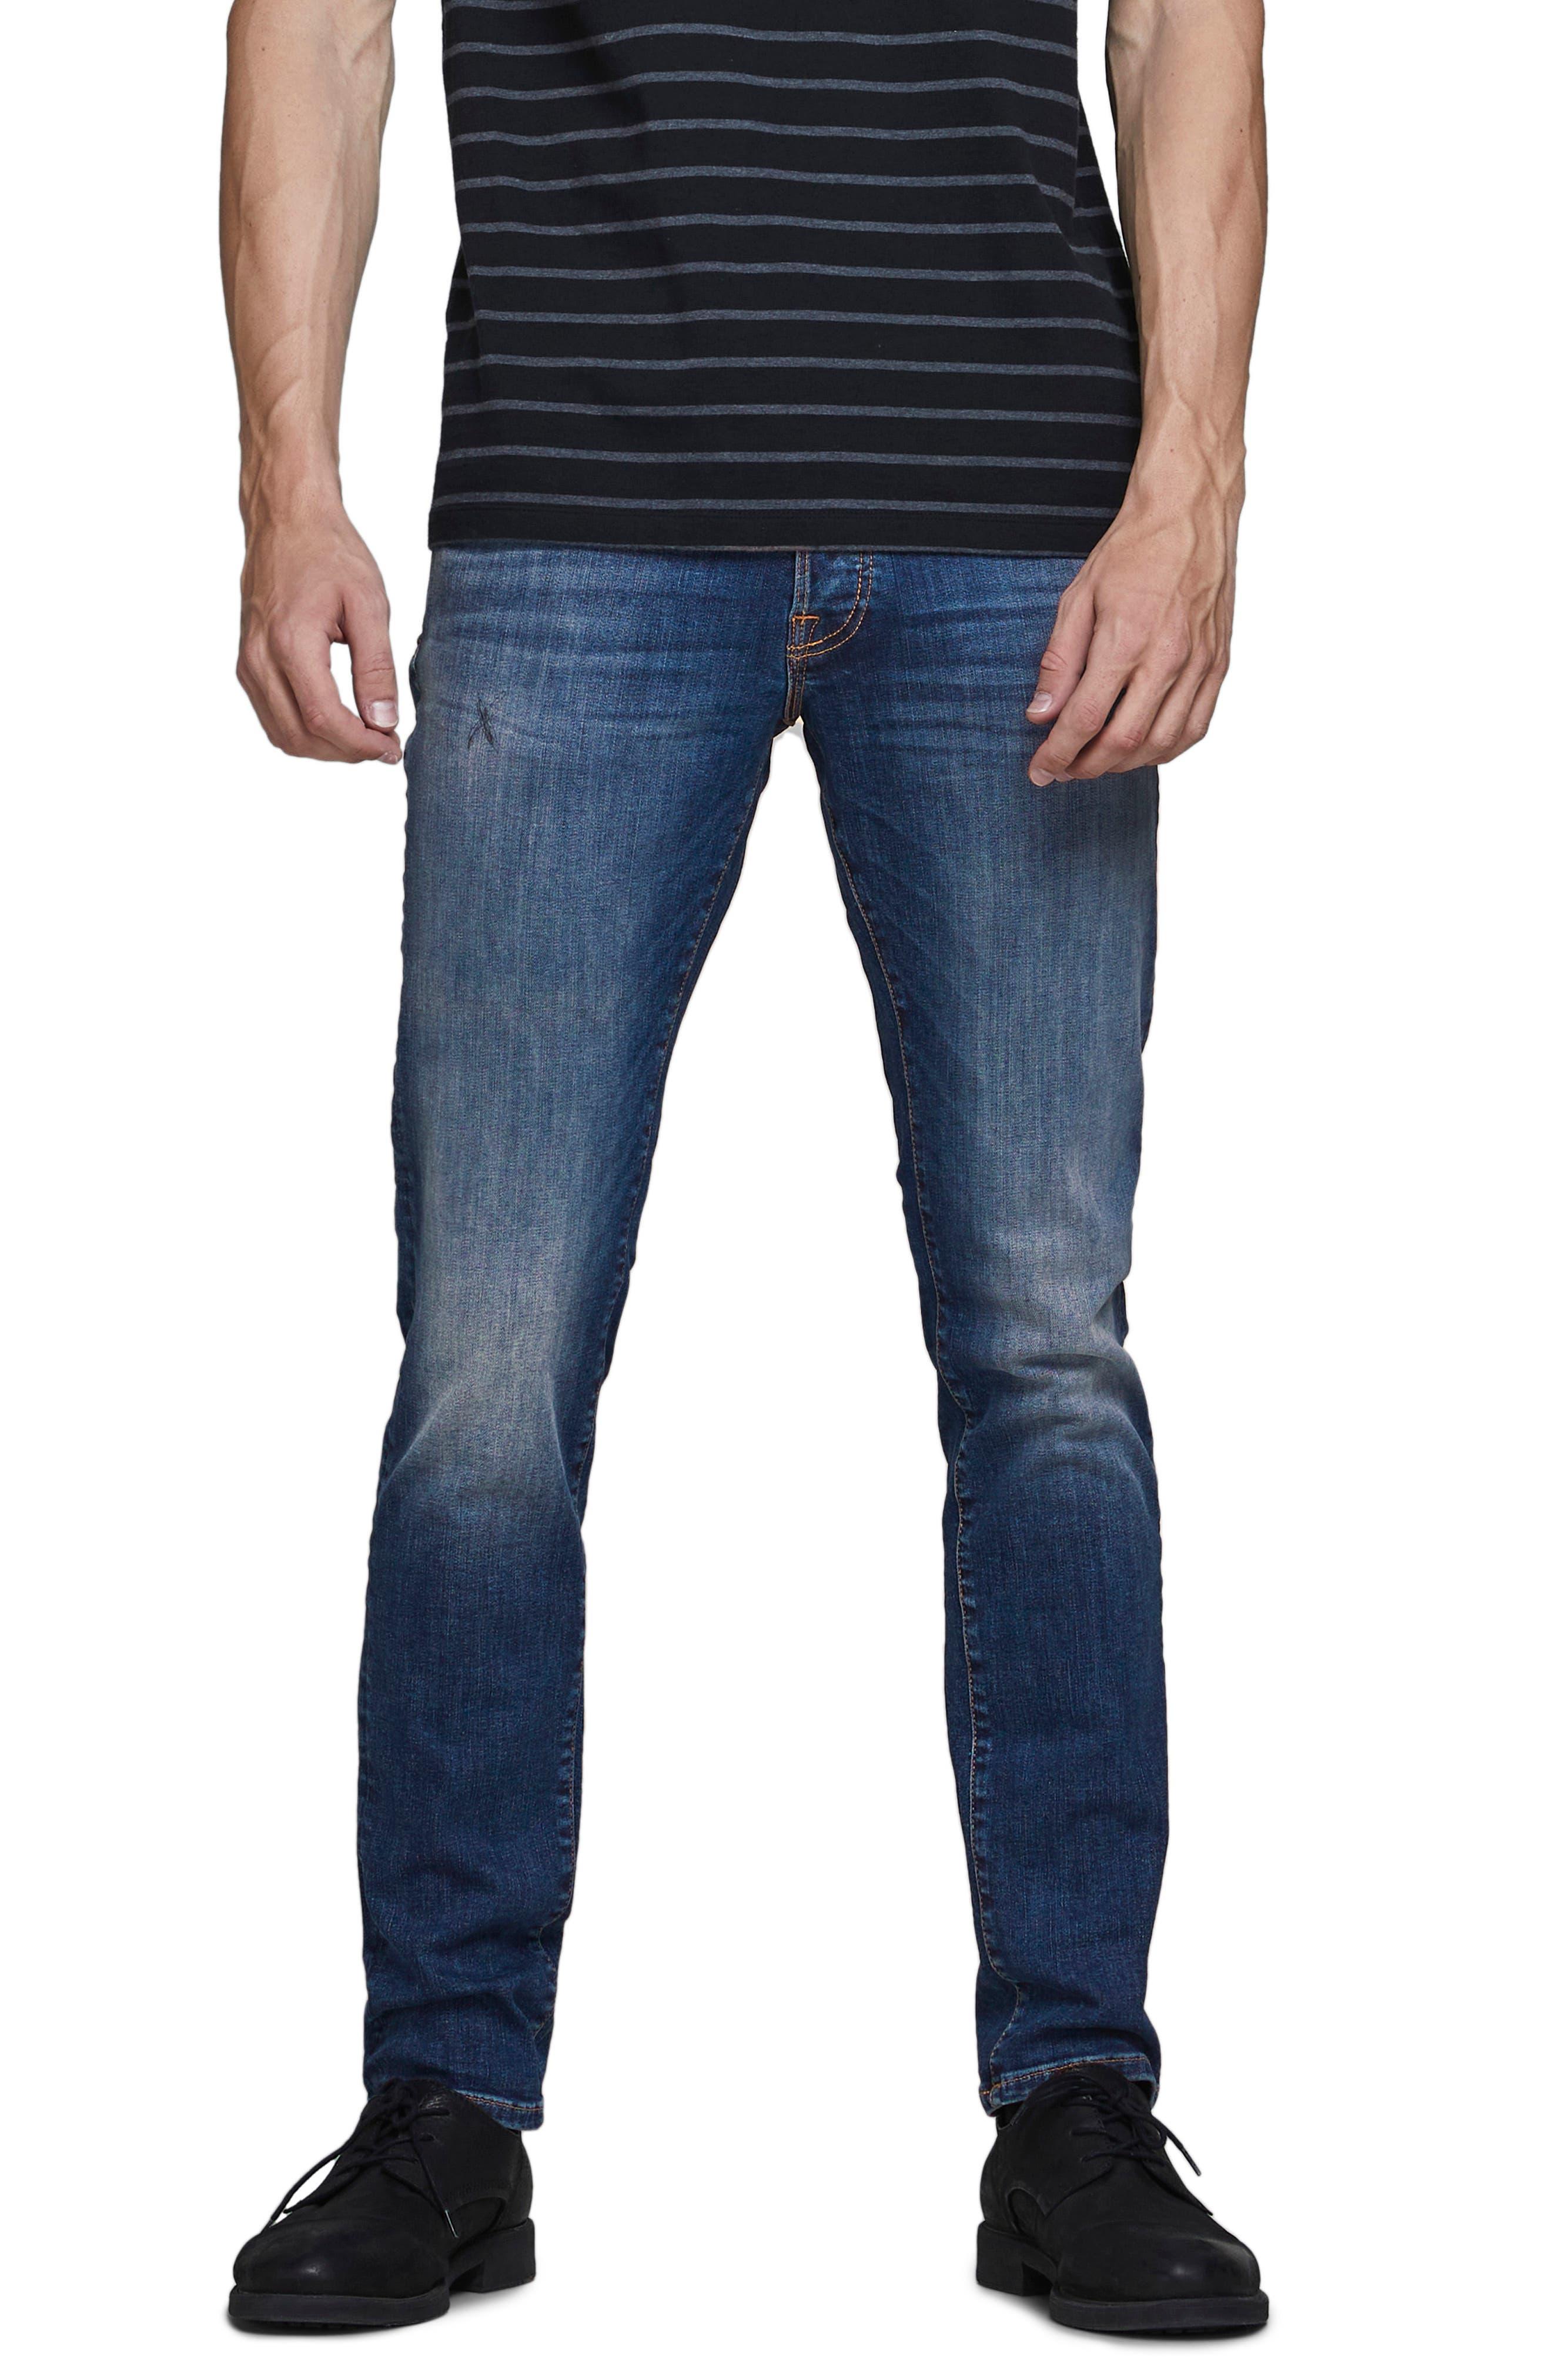 Glenn Fox Agi 204 50Sps Slim Fit Jeans